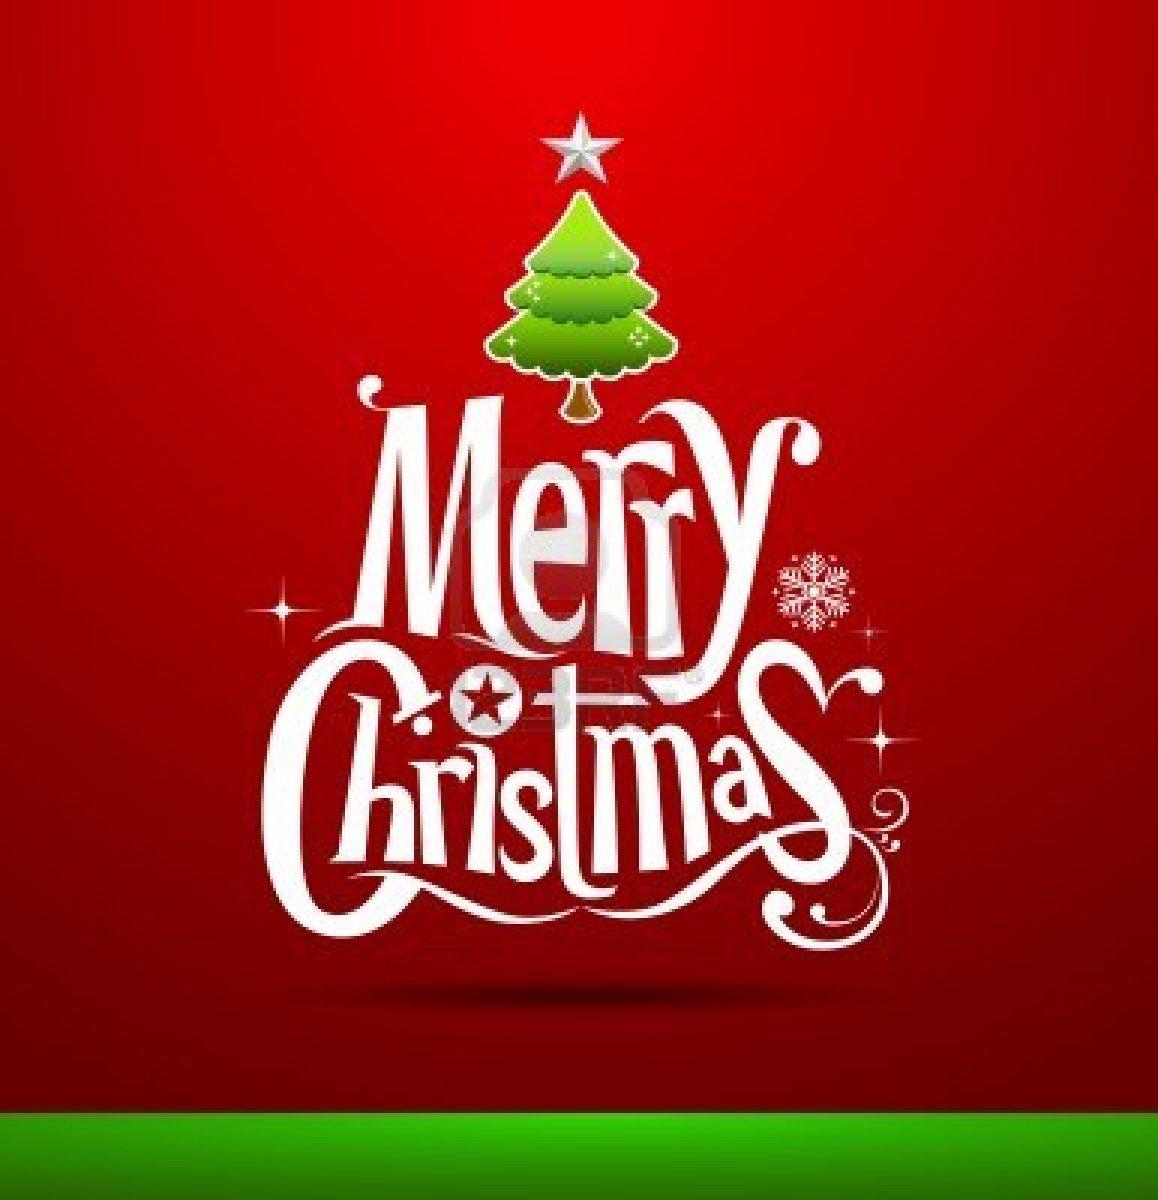 http://4.bp.blogspot.com/-fzrEWRZI6A4/UNiHJZ7nRSI/AAAAAAAAJSo/CGWPpLAfYSk/s1600/Merry+Cristmas+greeting+(1).jpg